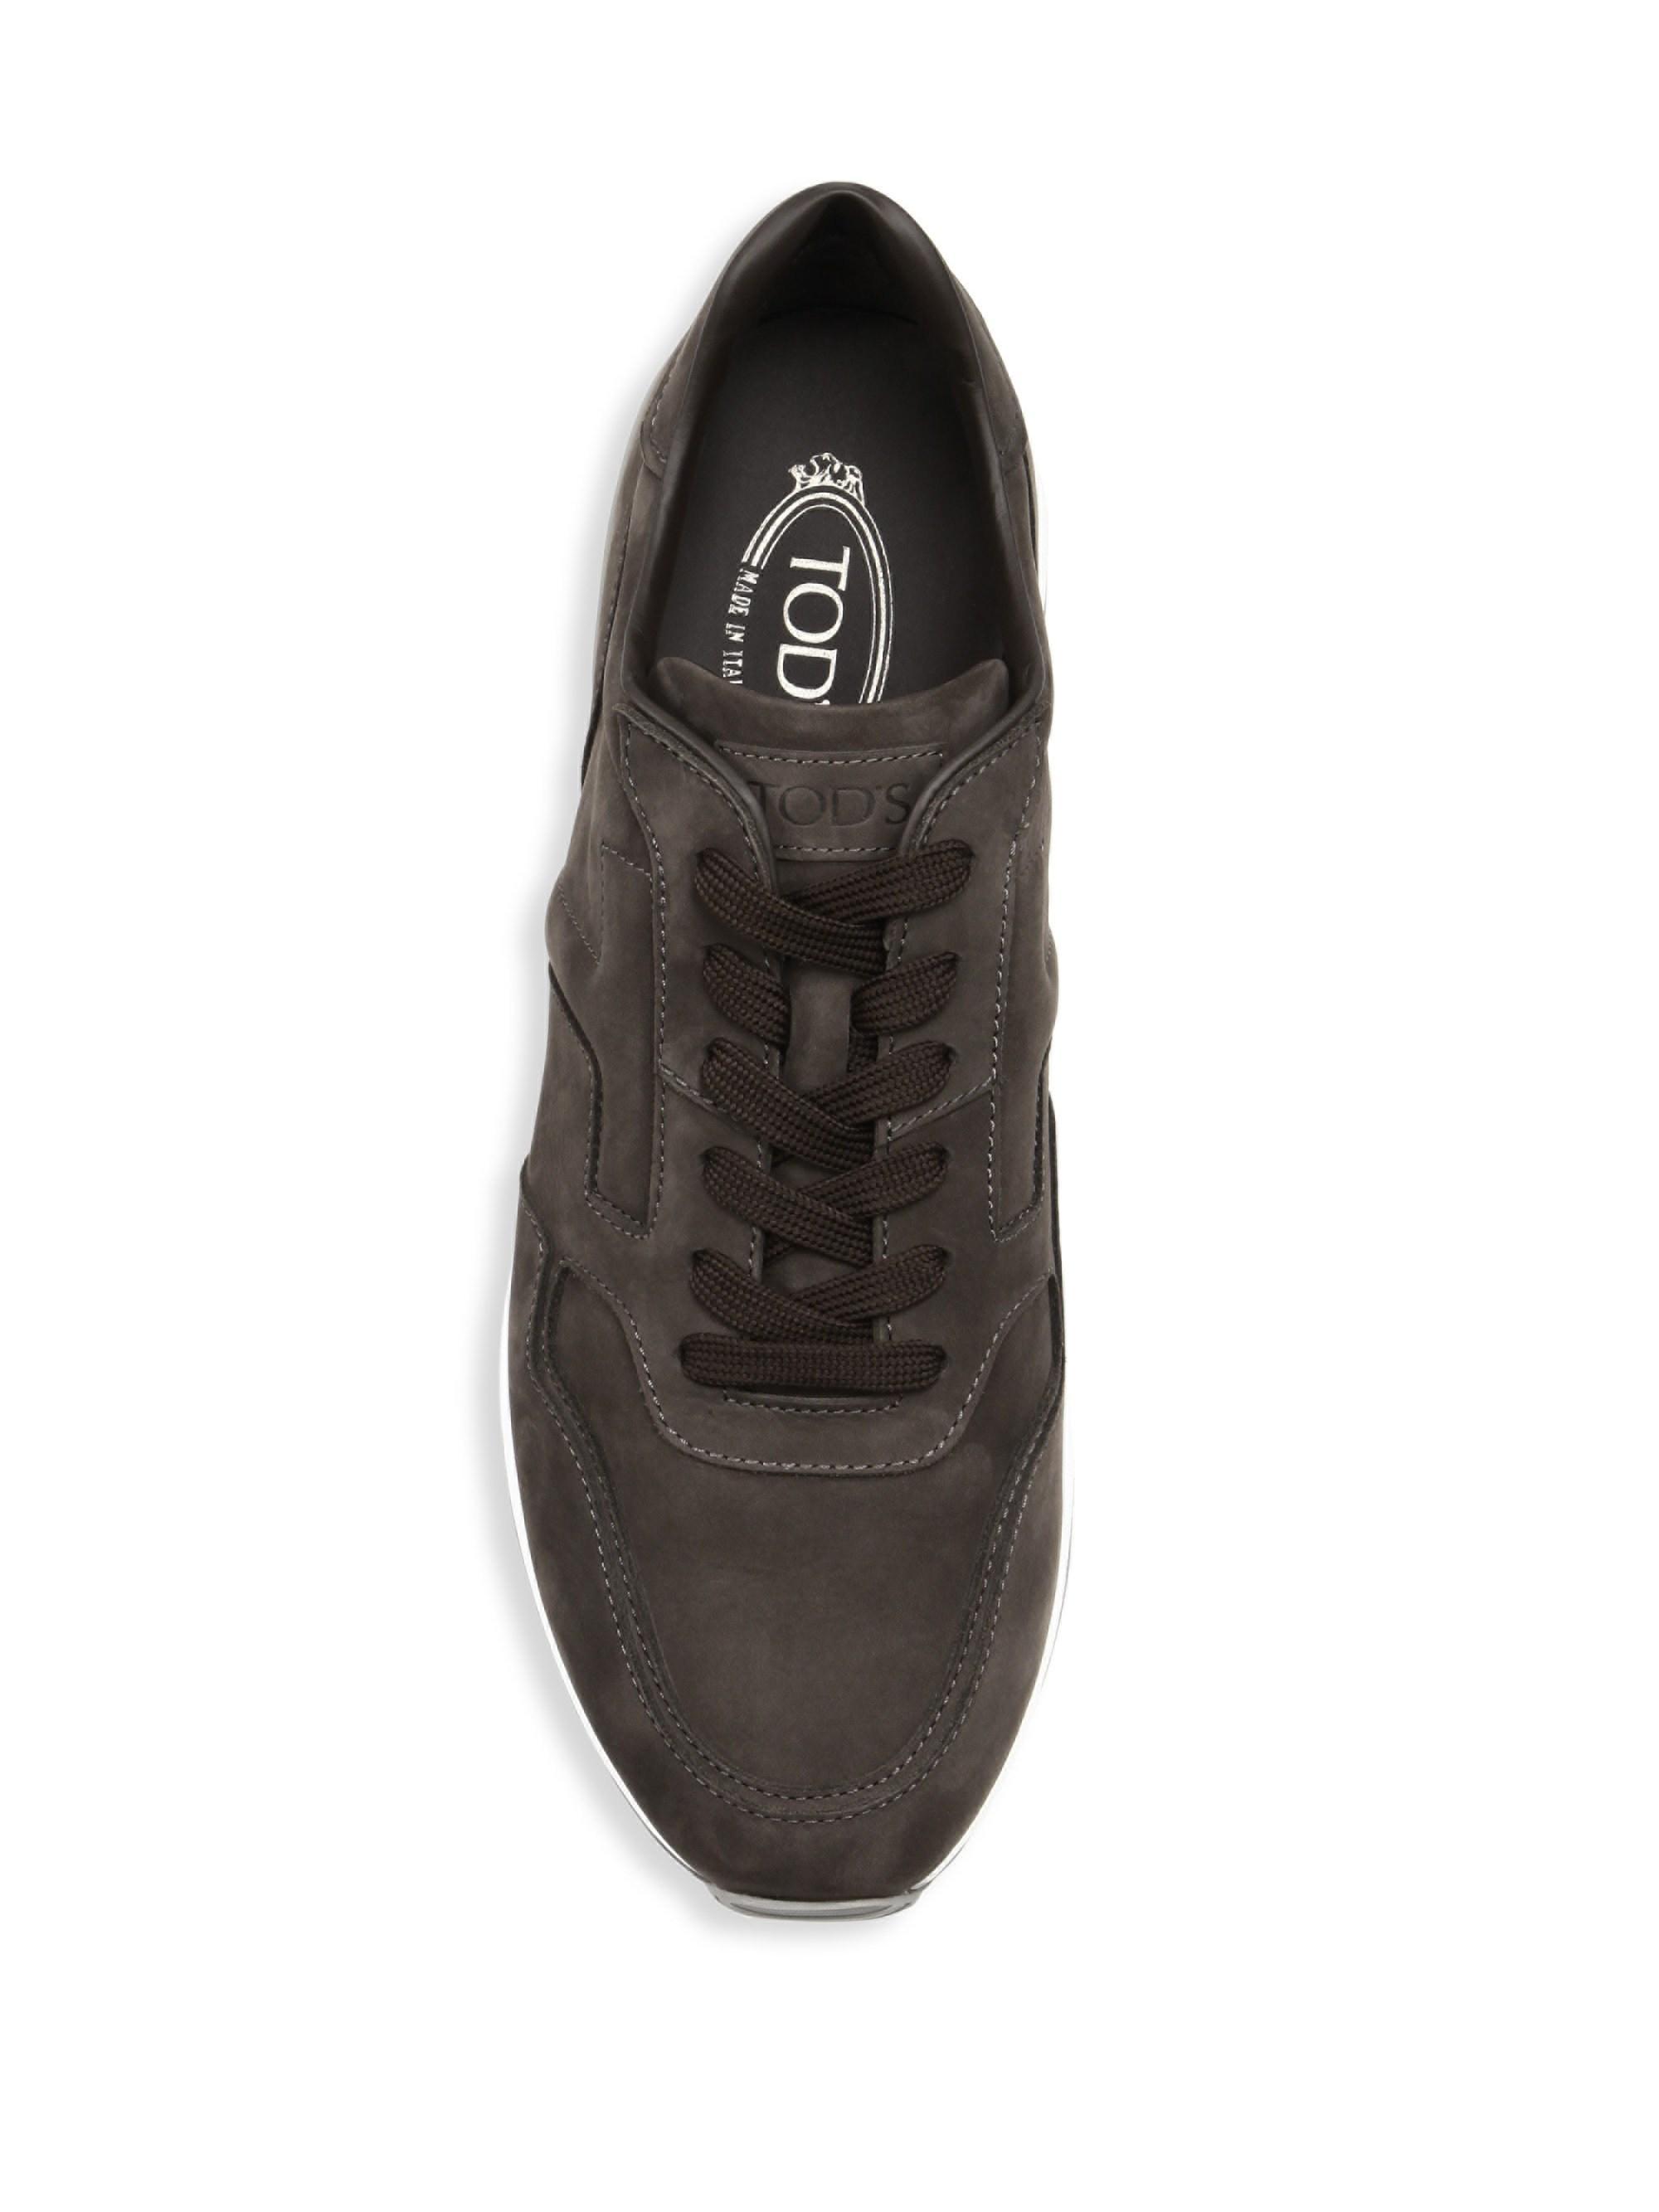 Tod's Leather Men's Nuovo Modello